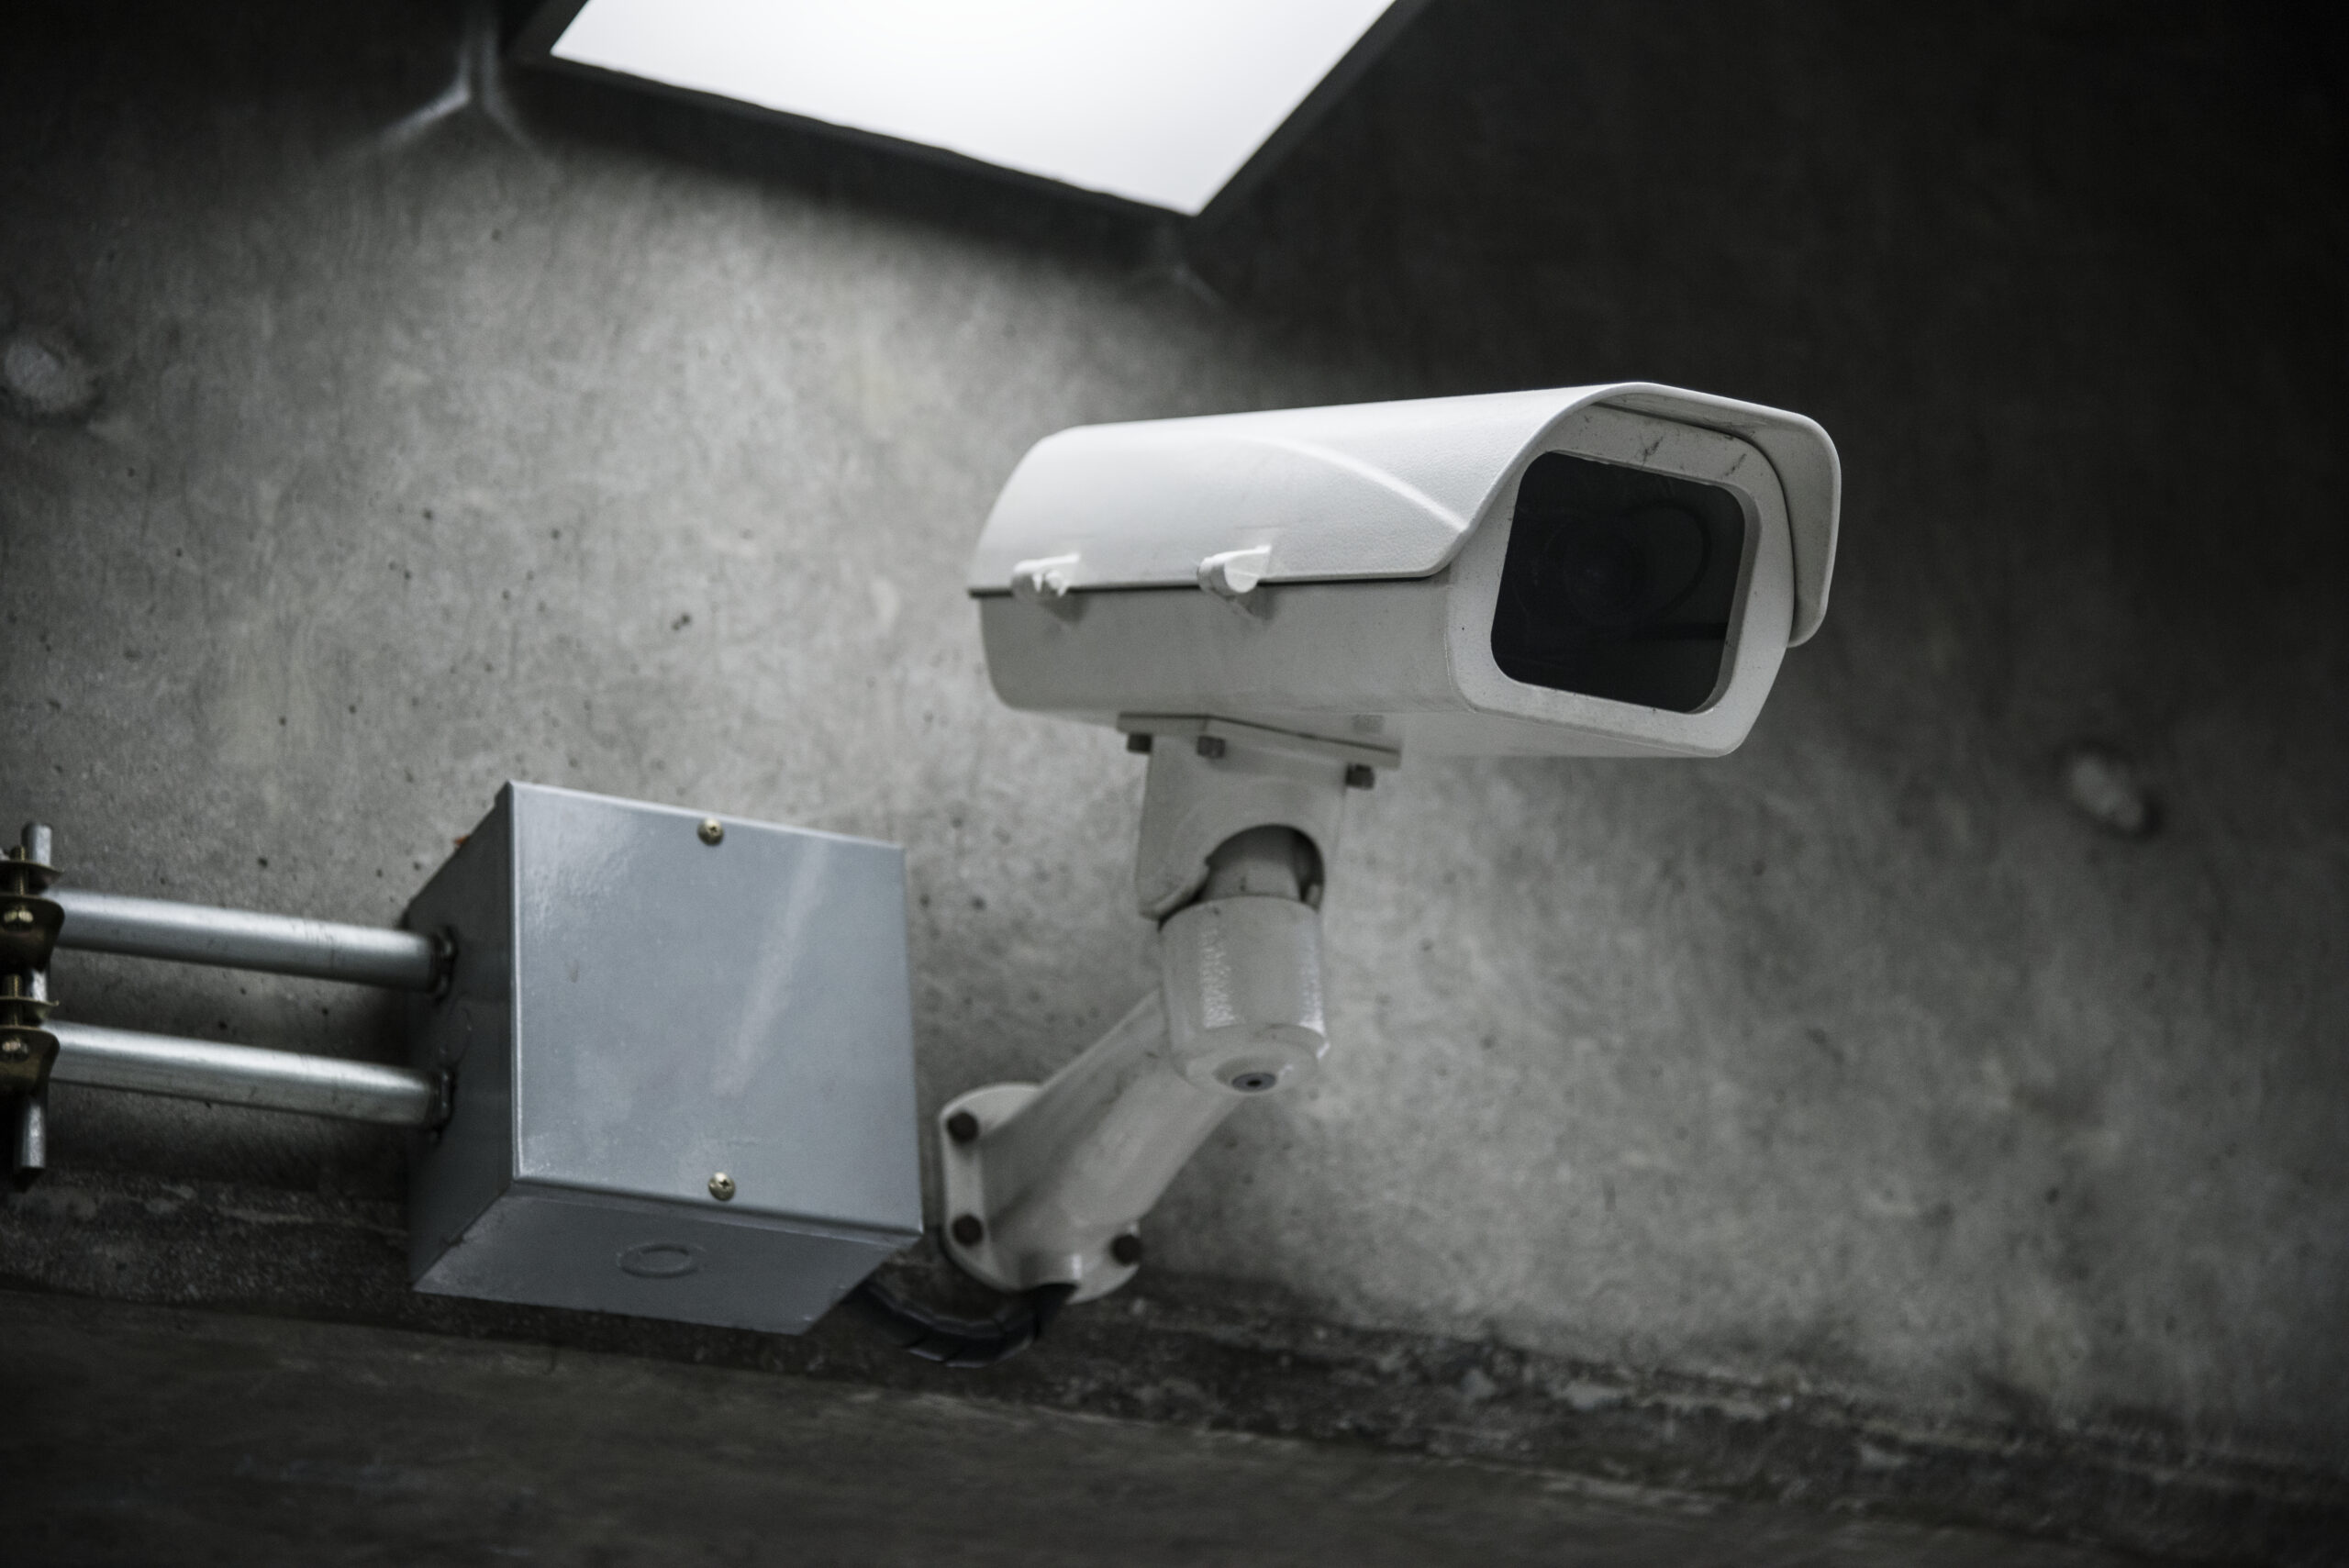 guvenlik-kamerasi-hizmeti-1607